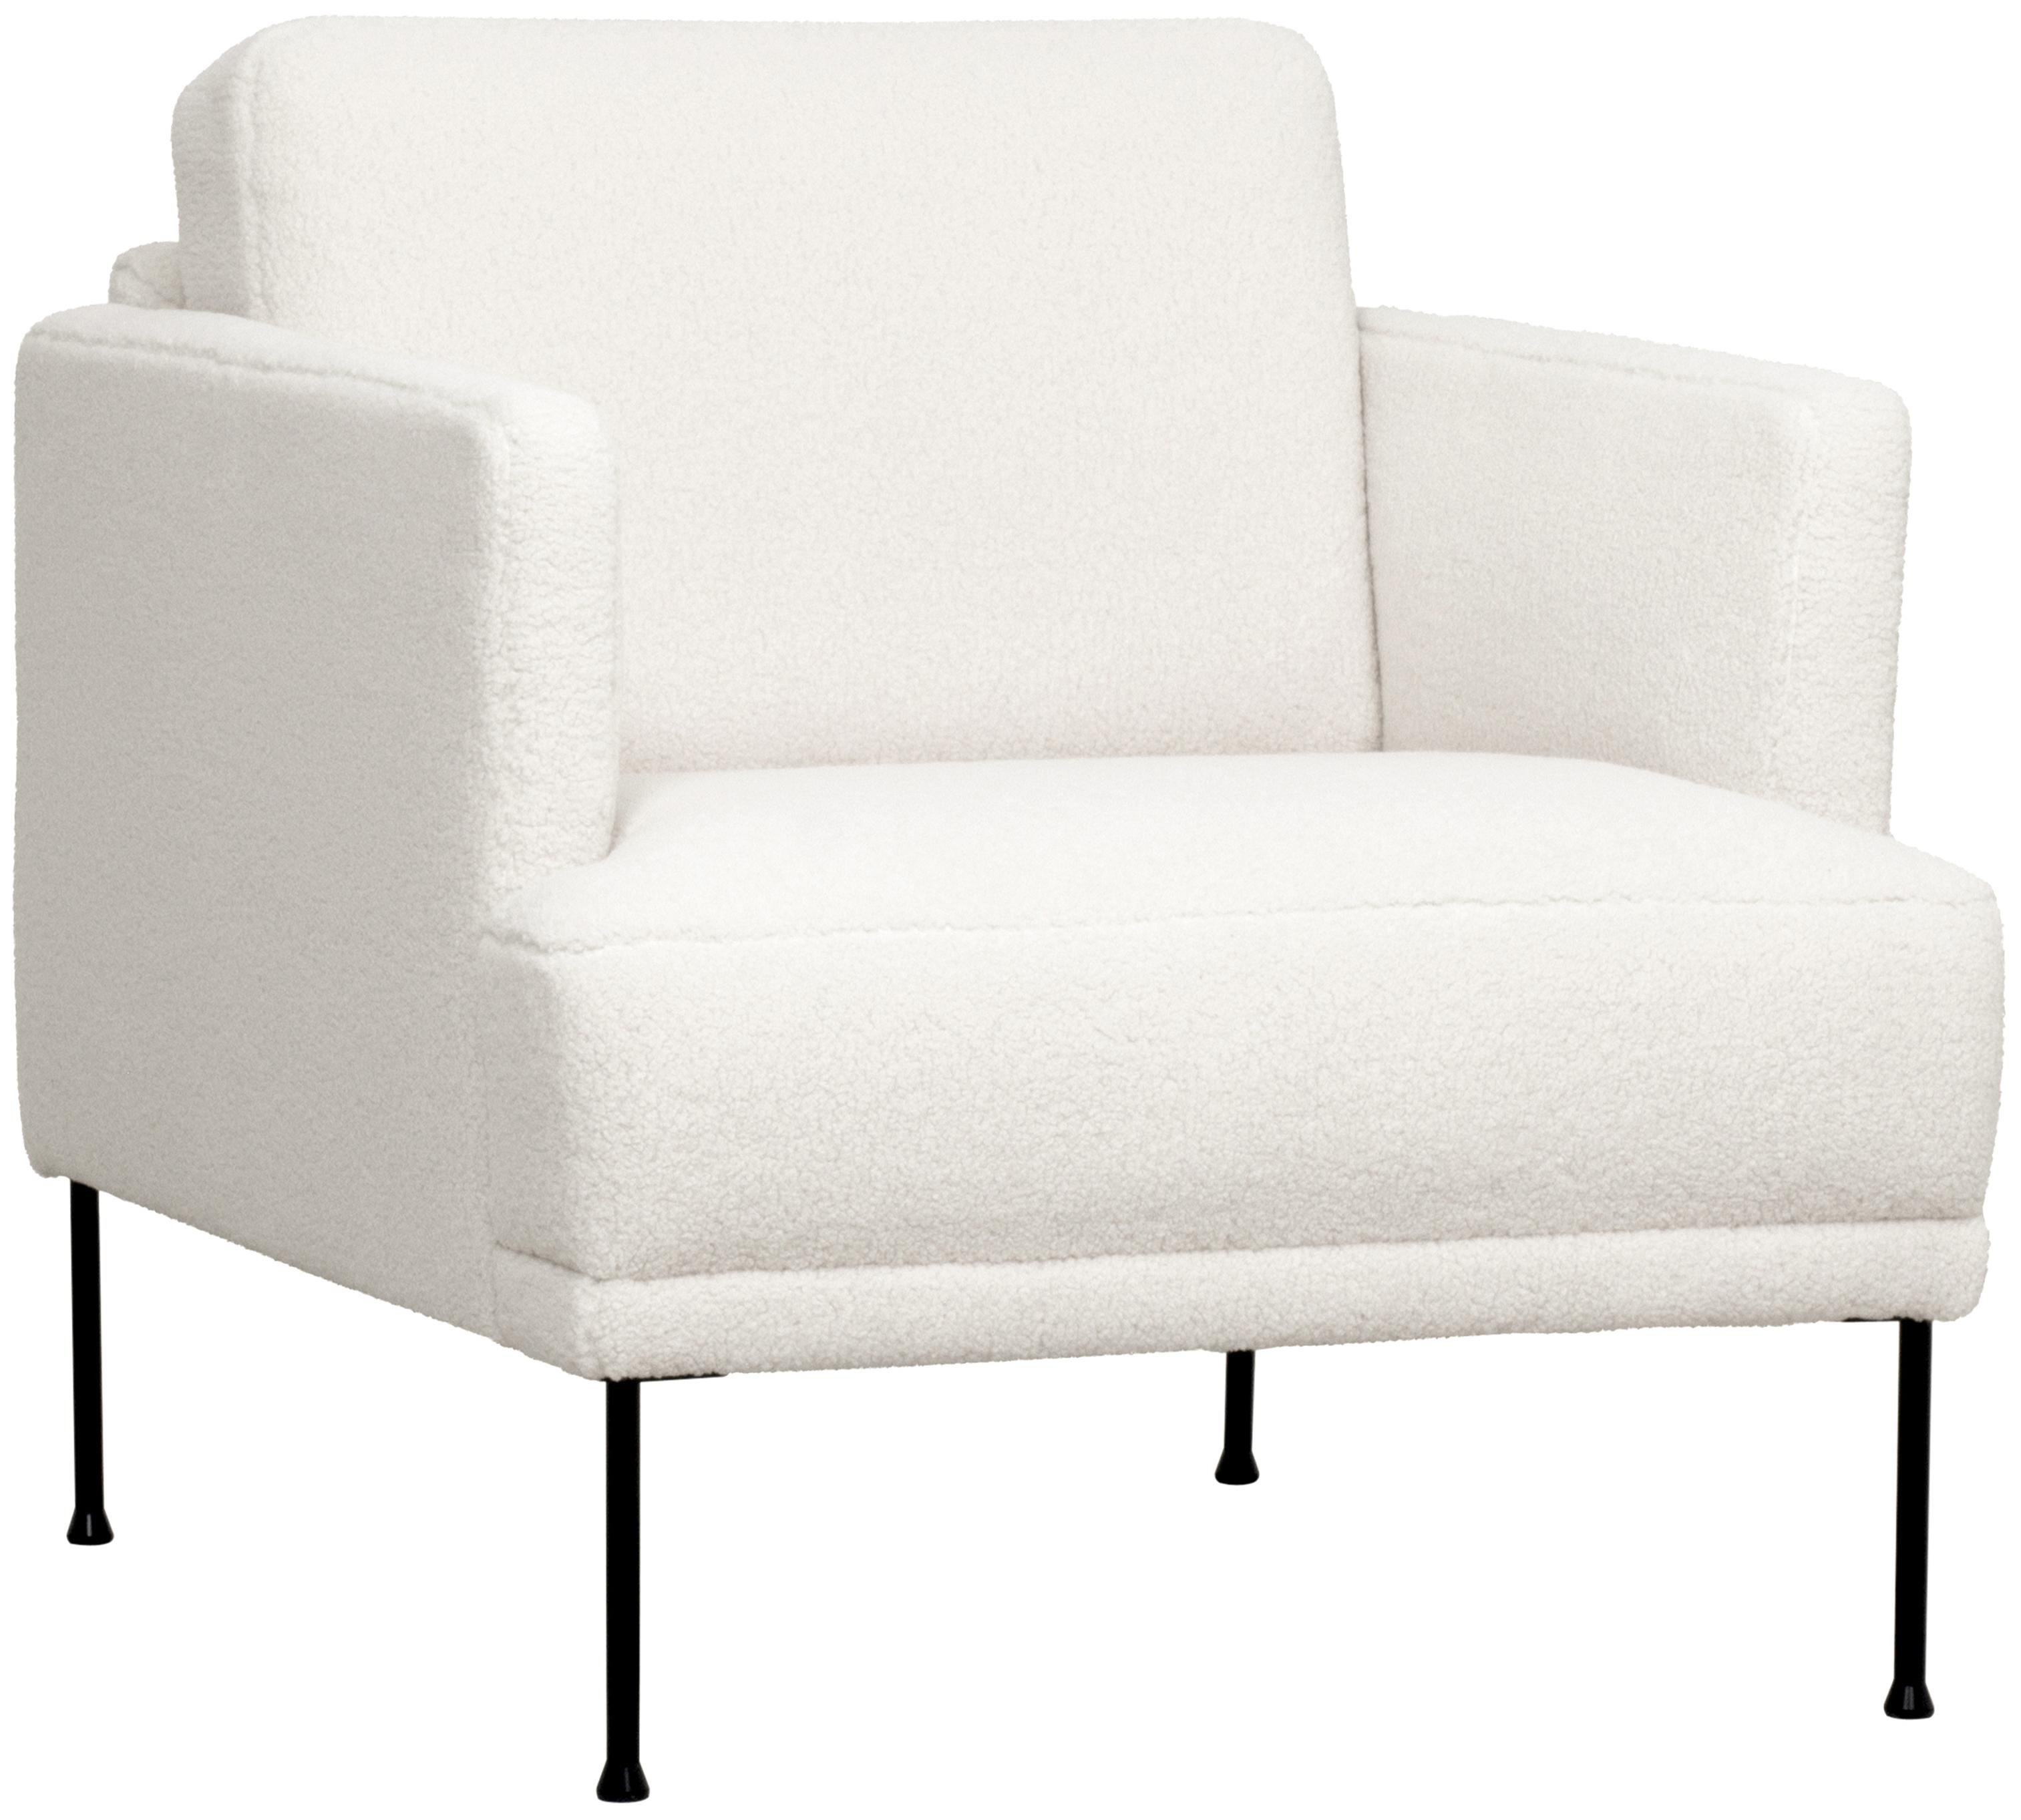 Teddy-Sessel Fluente, Bezug: 100% Polyester (Teddyfell, Gestell: Massives Kiefernholz, Füße: Metall, pulverbeschichtet, Teddy Cremeweiß, B 74 x T 85 cm